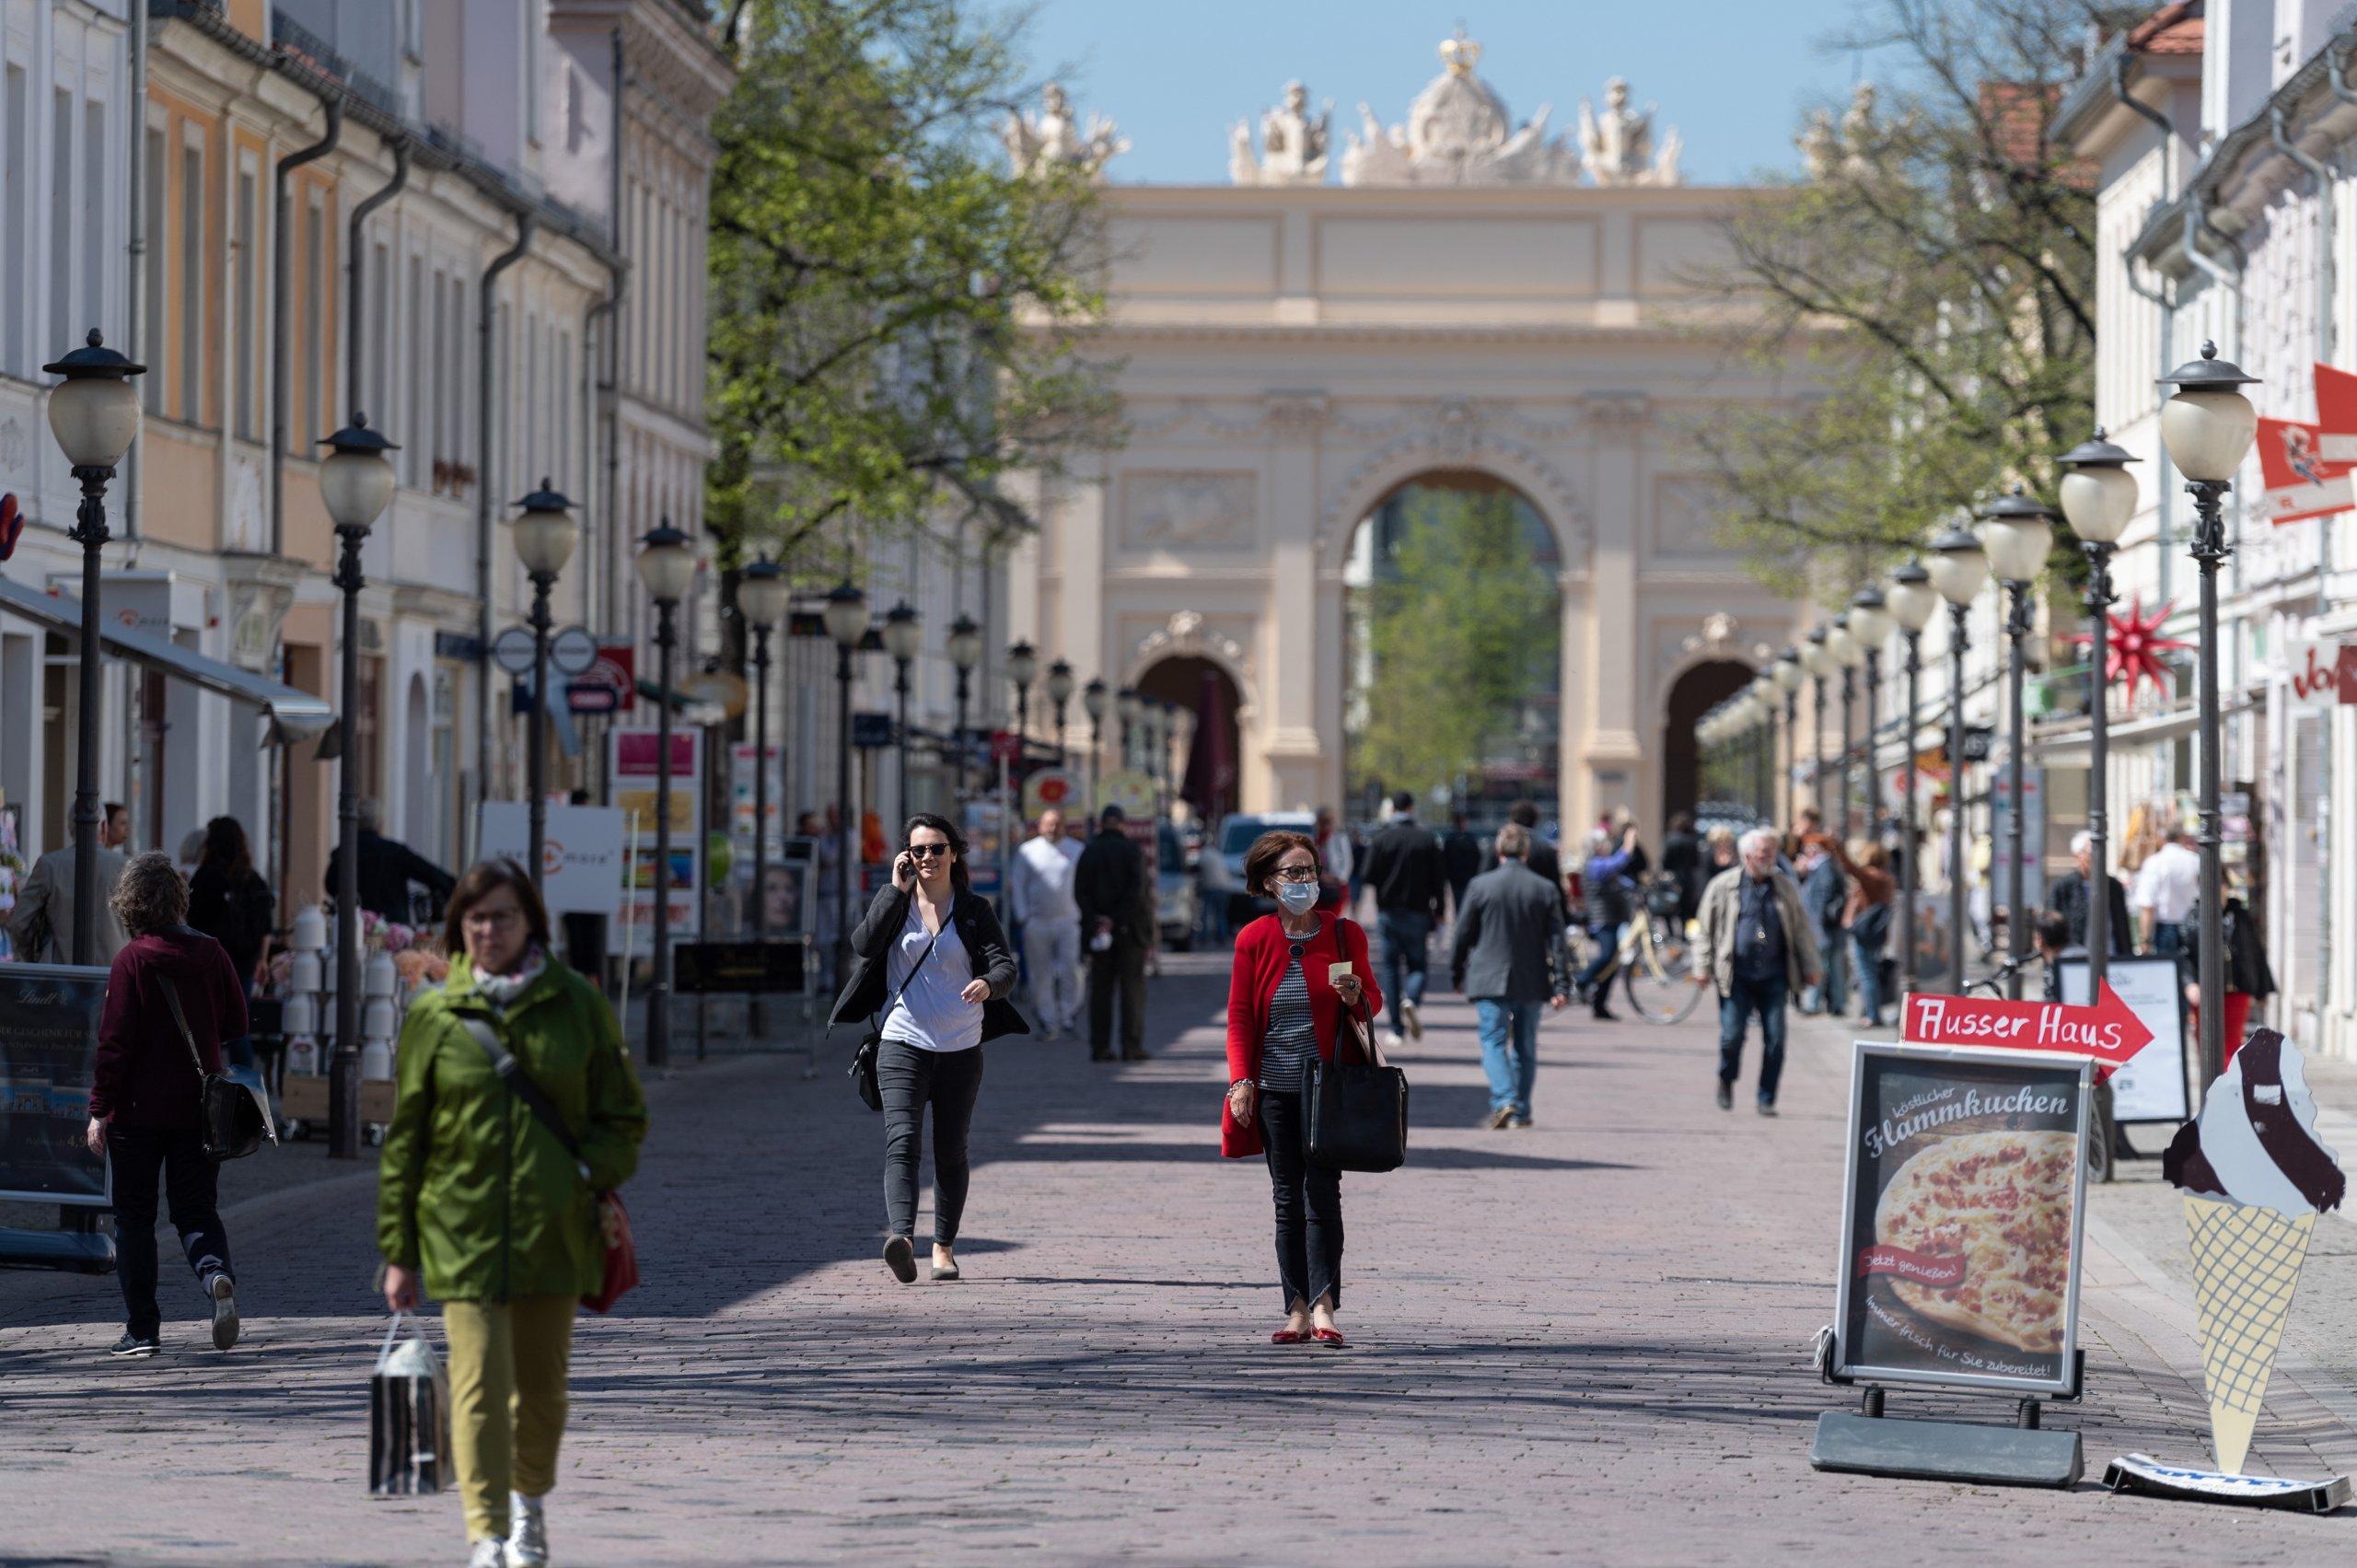 Coronavirus - Smaller shops can open again